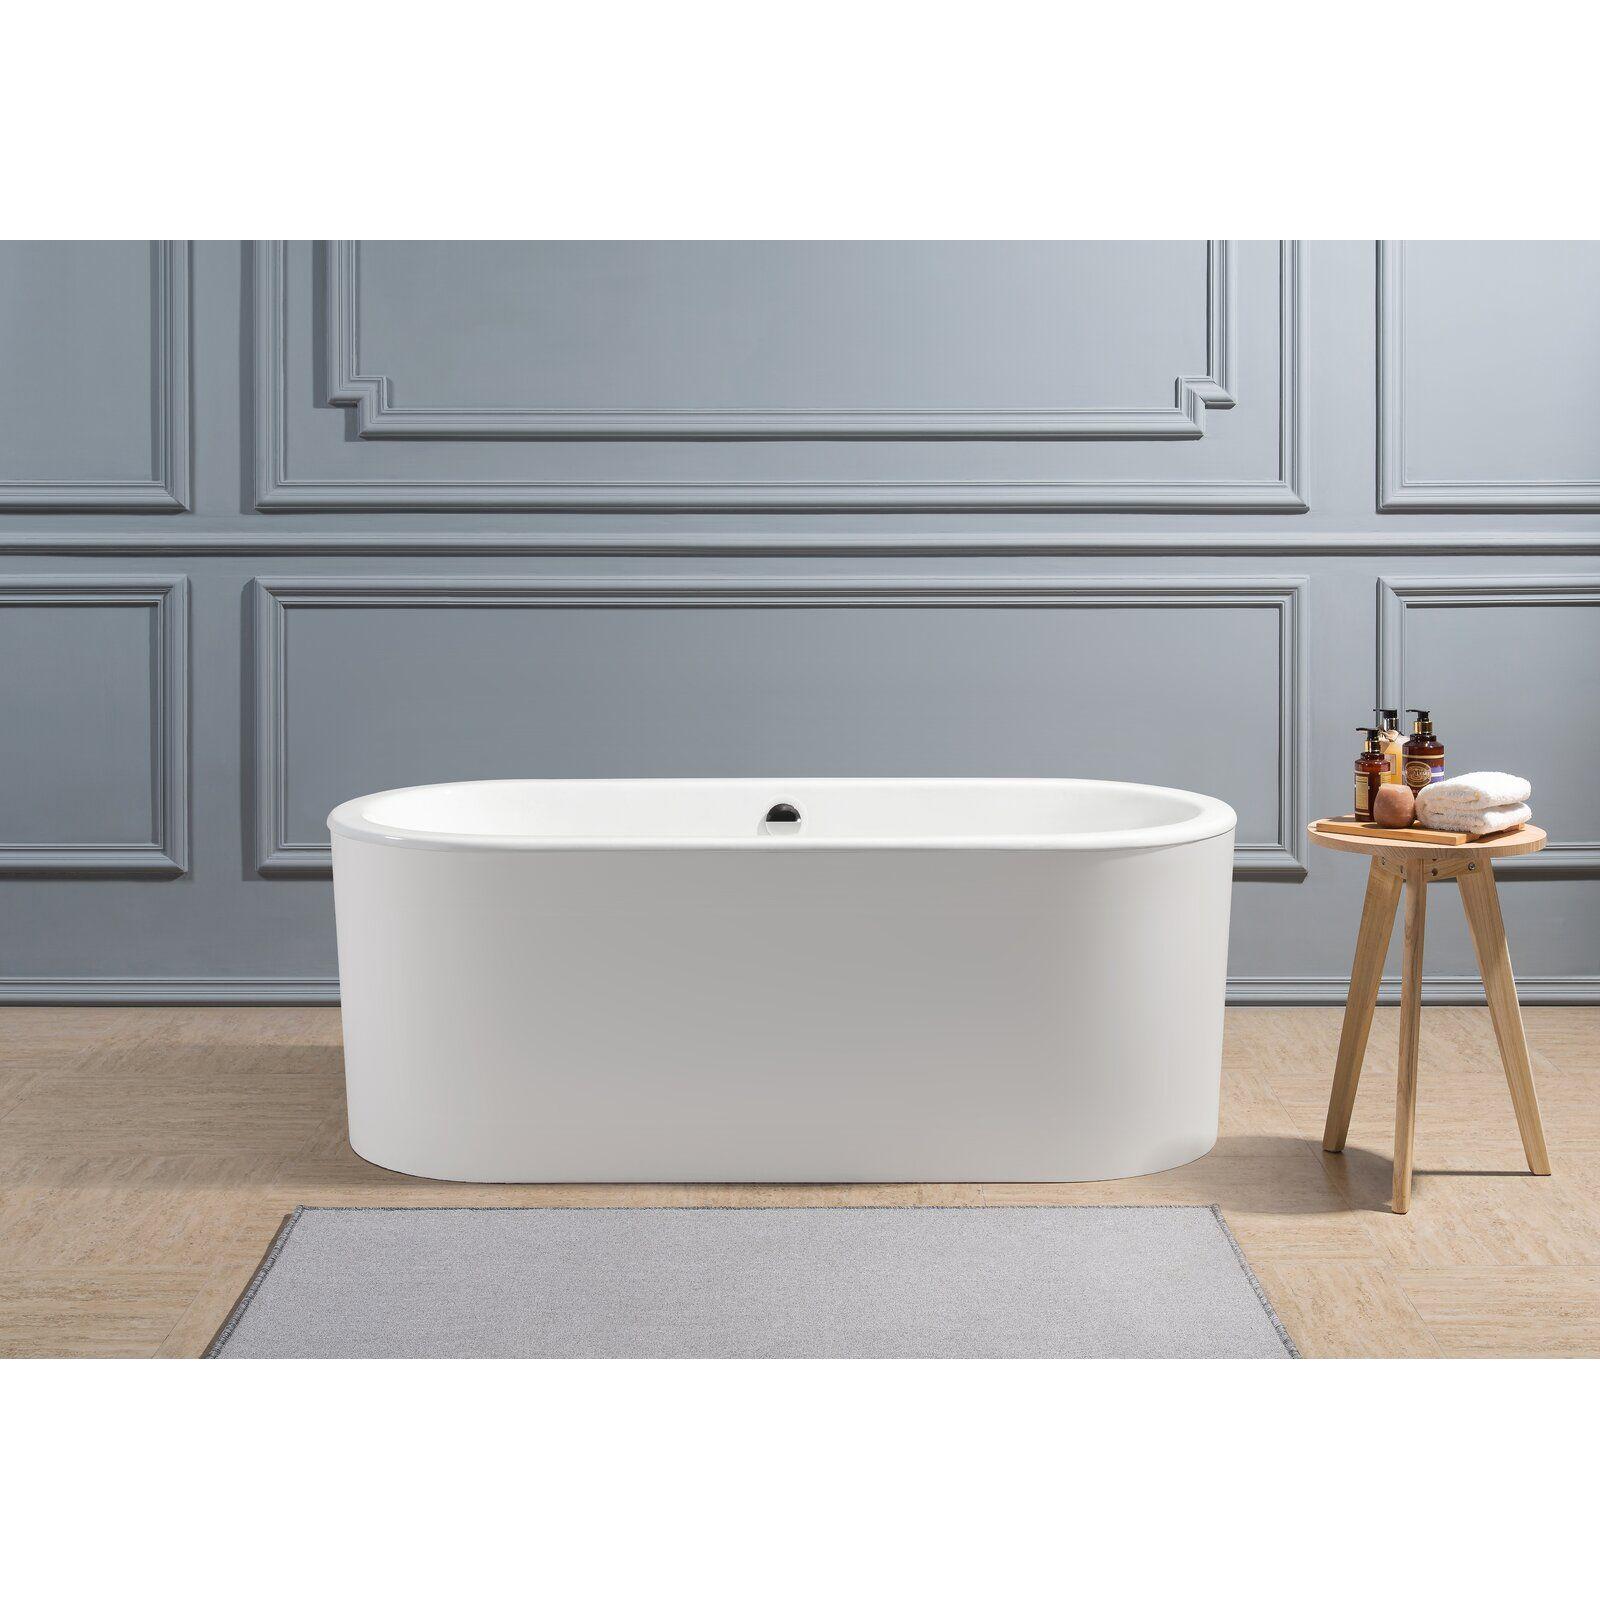 Cast Iron 67 X 30 Freestanding Soaking Bathtub With Images